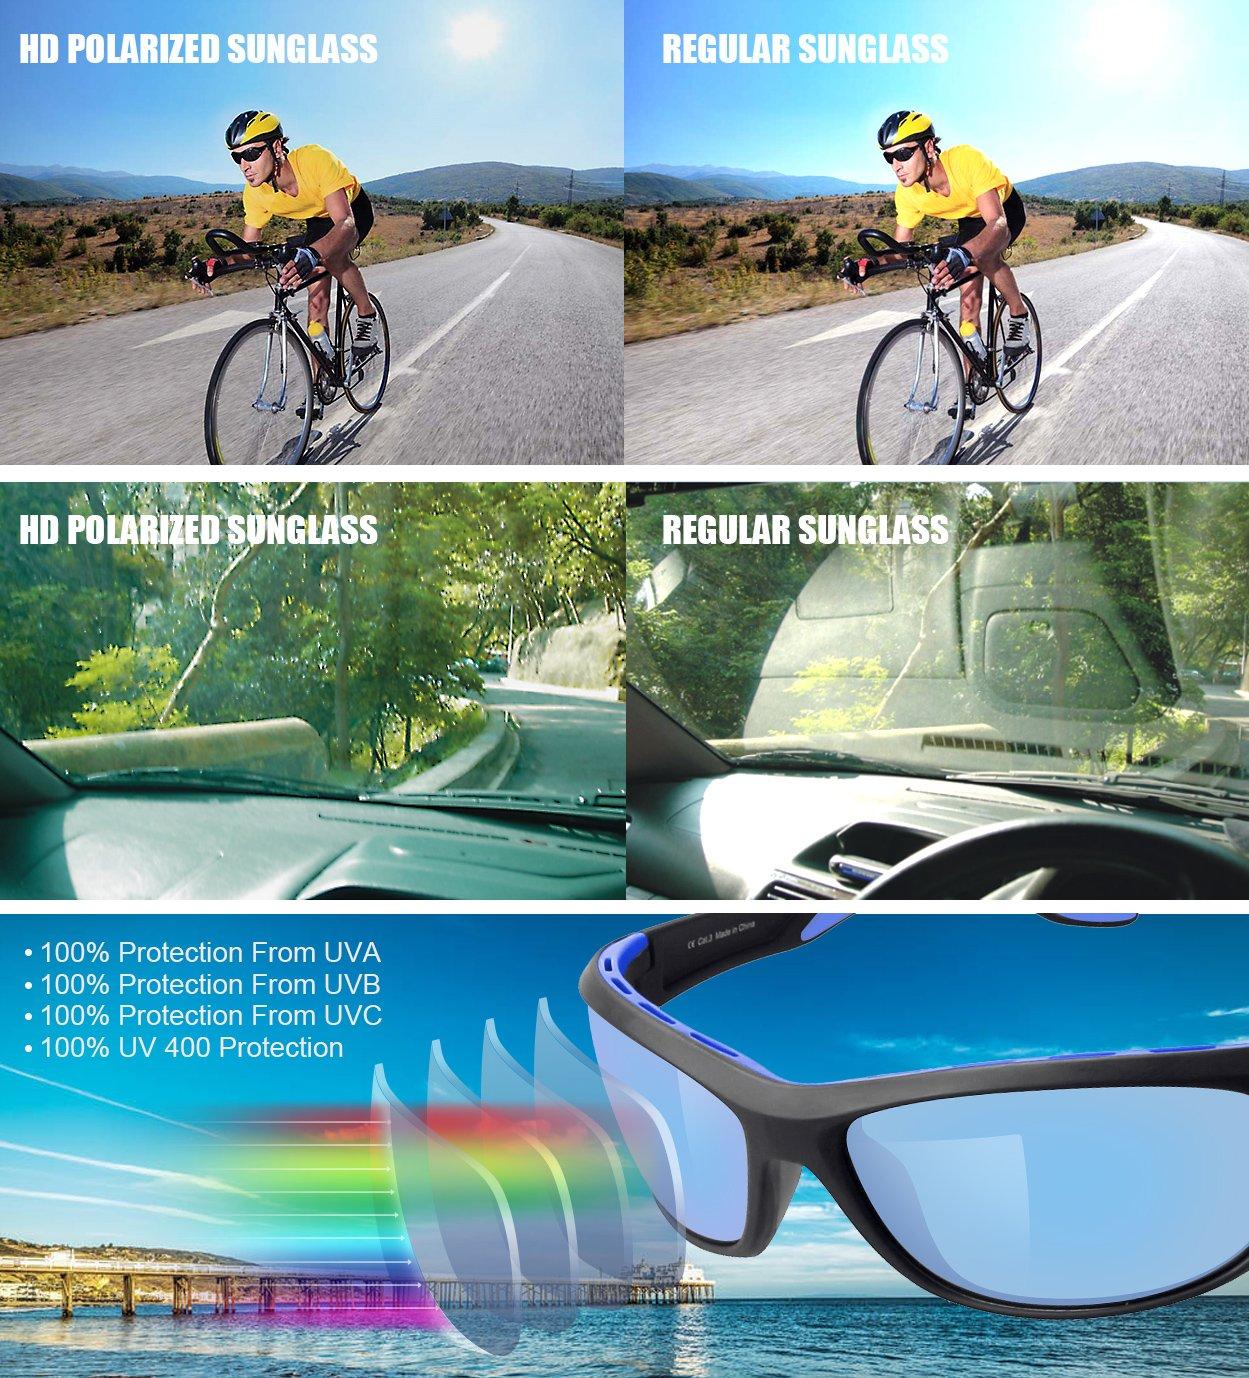 c5c2c03e21 Sport Sunglasses Mens Polarised Sunglass Mirrored Driving Sunglasses Anti  Glare Sunglasses UV 400 Protection SuperLight Switzerland Grilamid TR90  Frame for ...